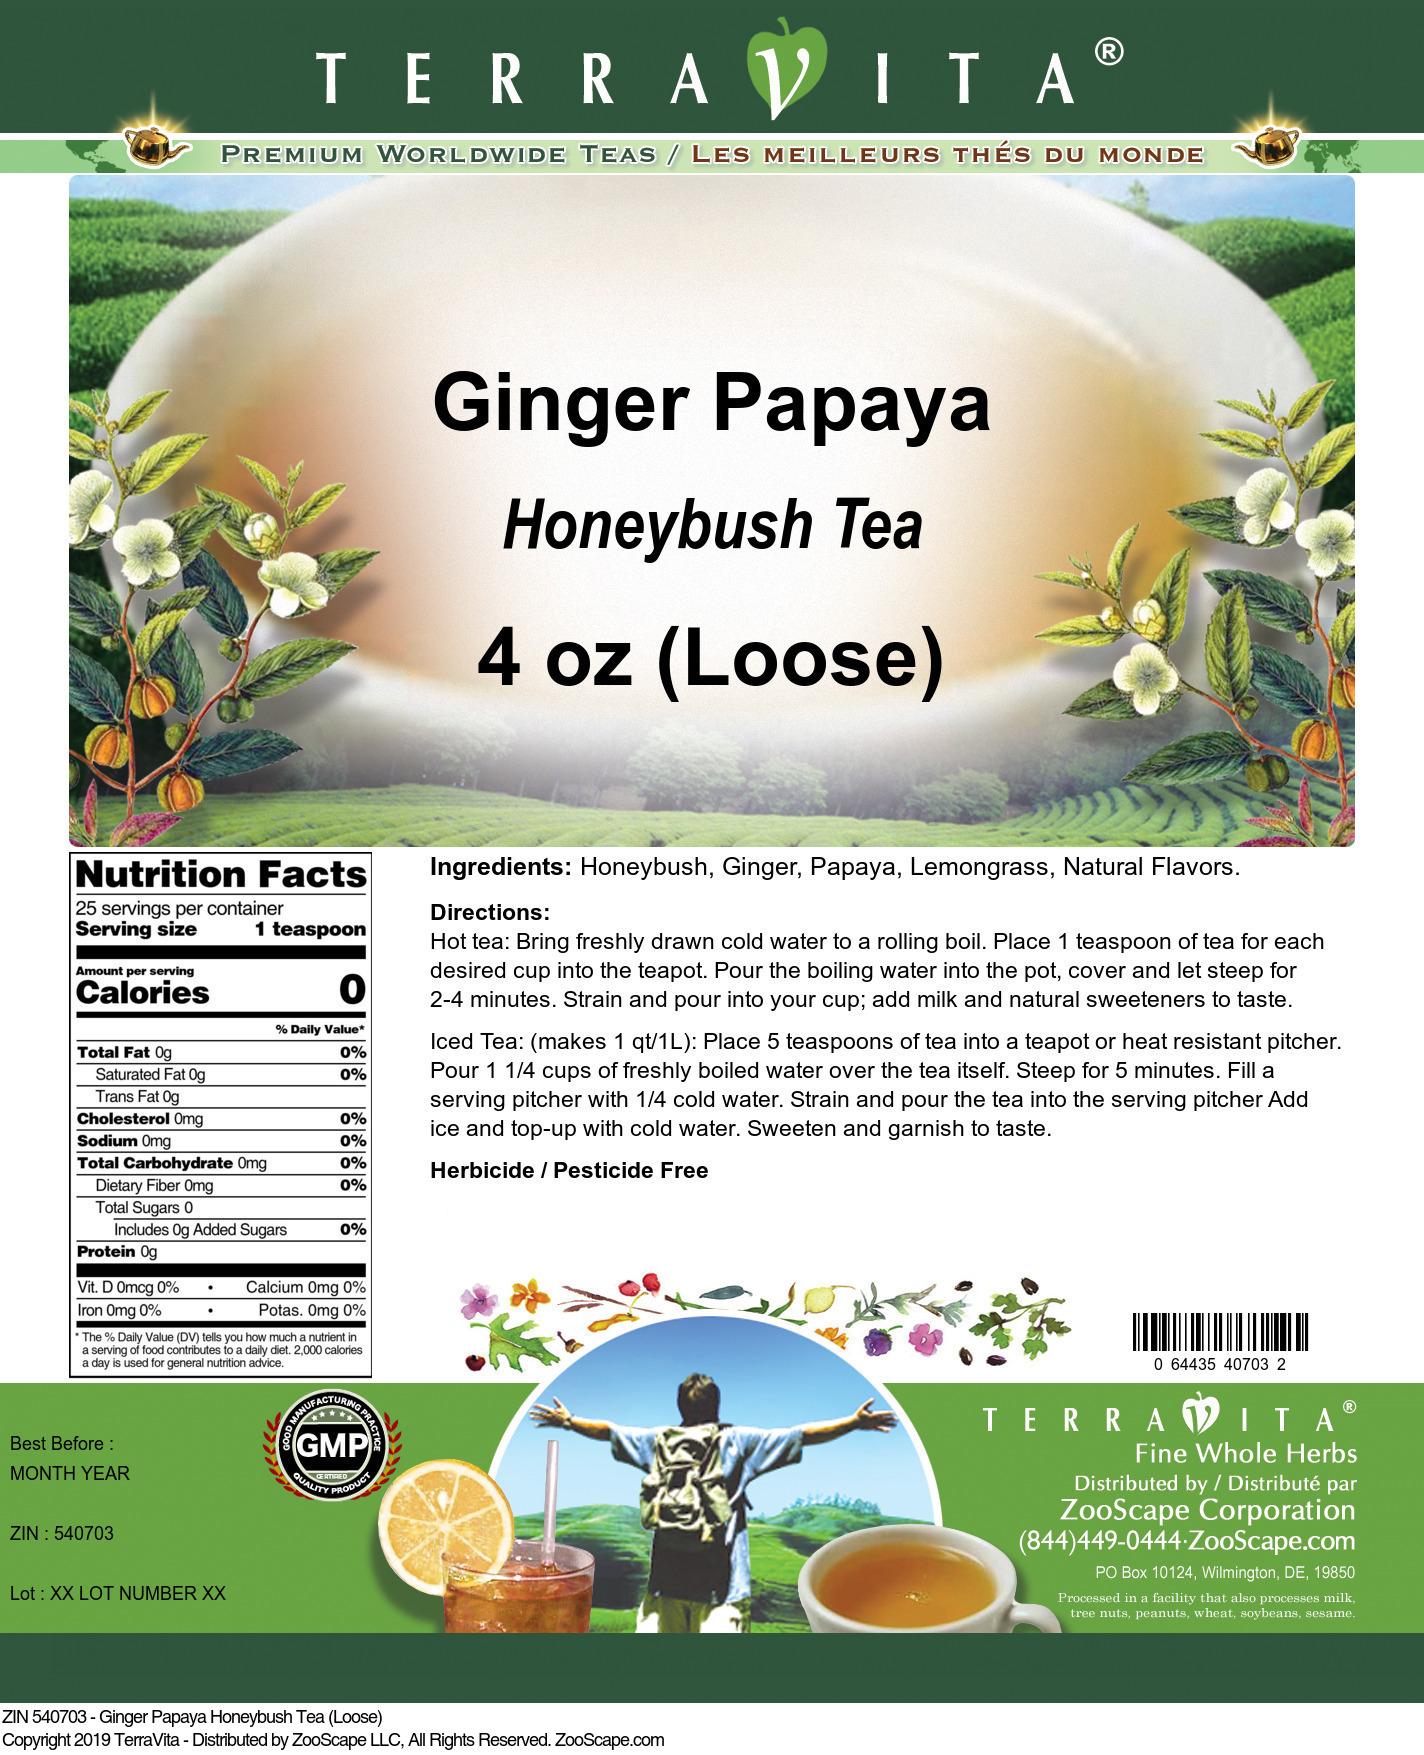 Ginger Papaya Honeybush Tea (Loose)